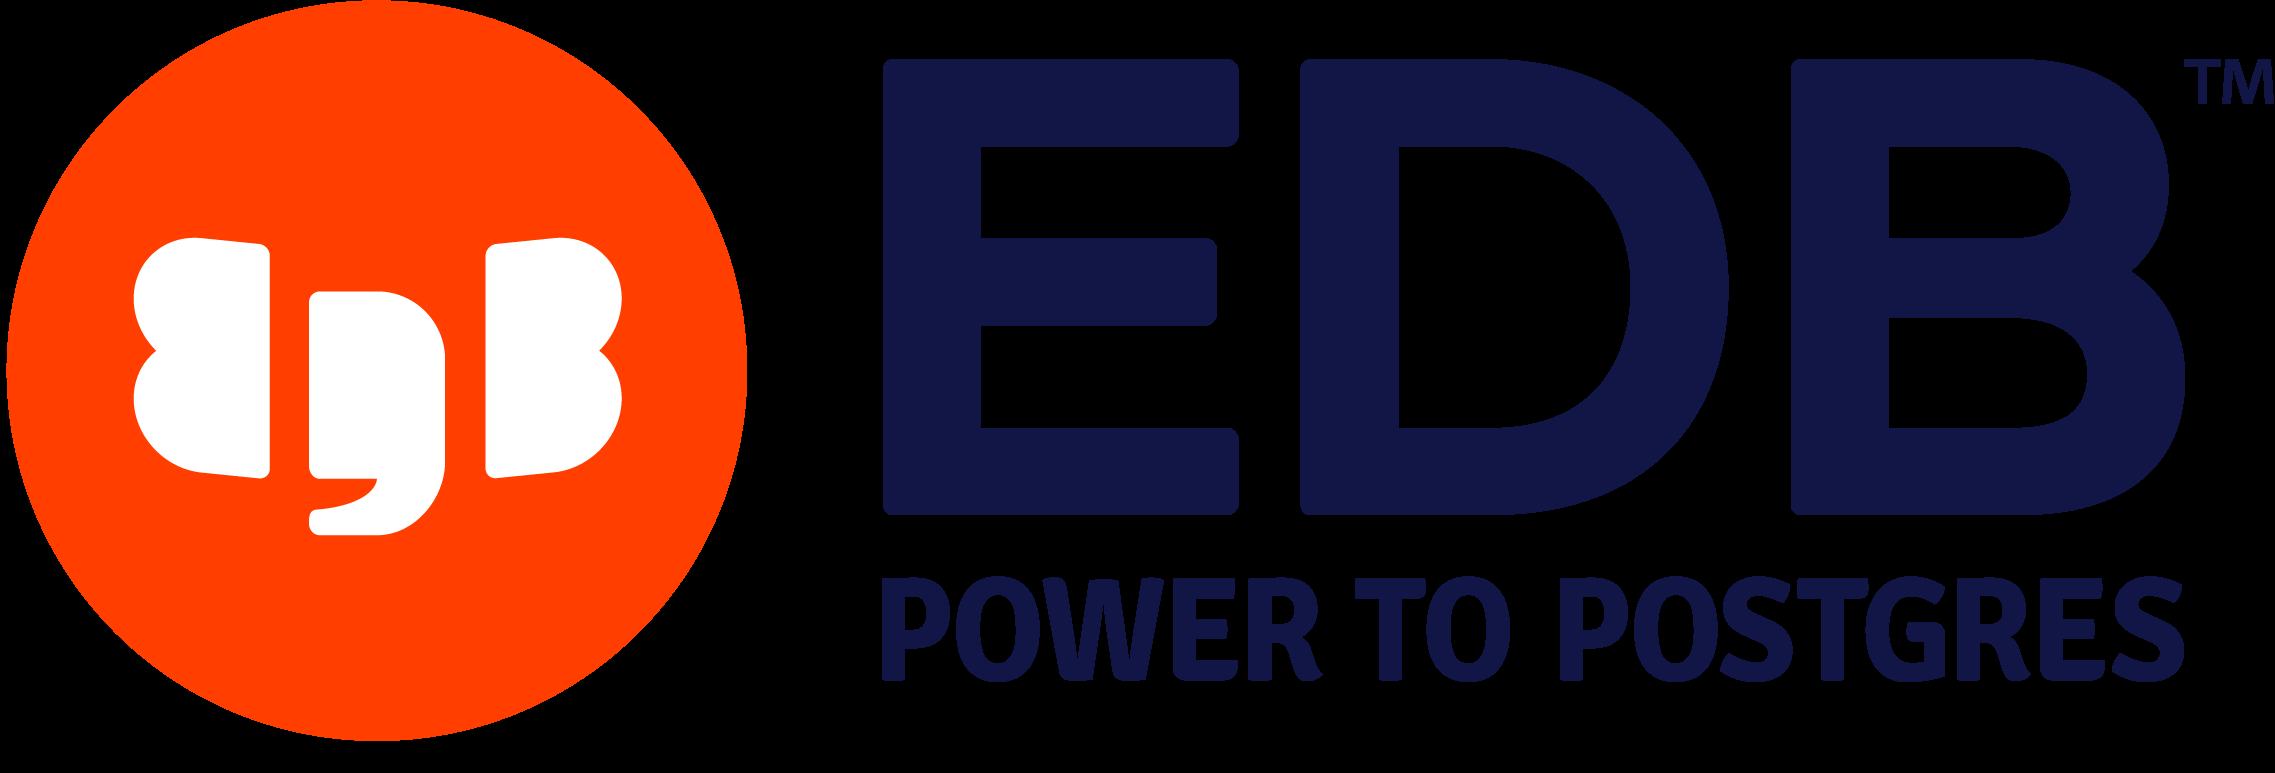 EnterpriseDB - Wikipedia